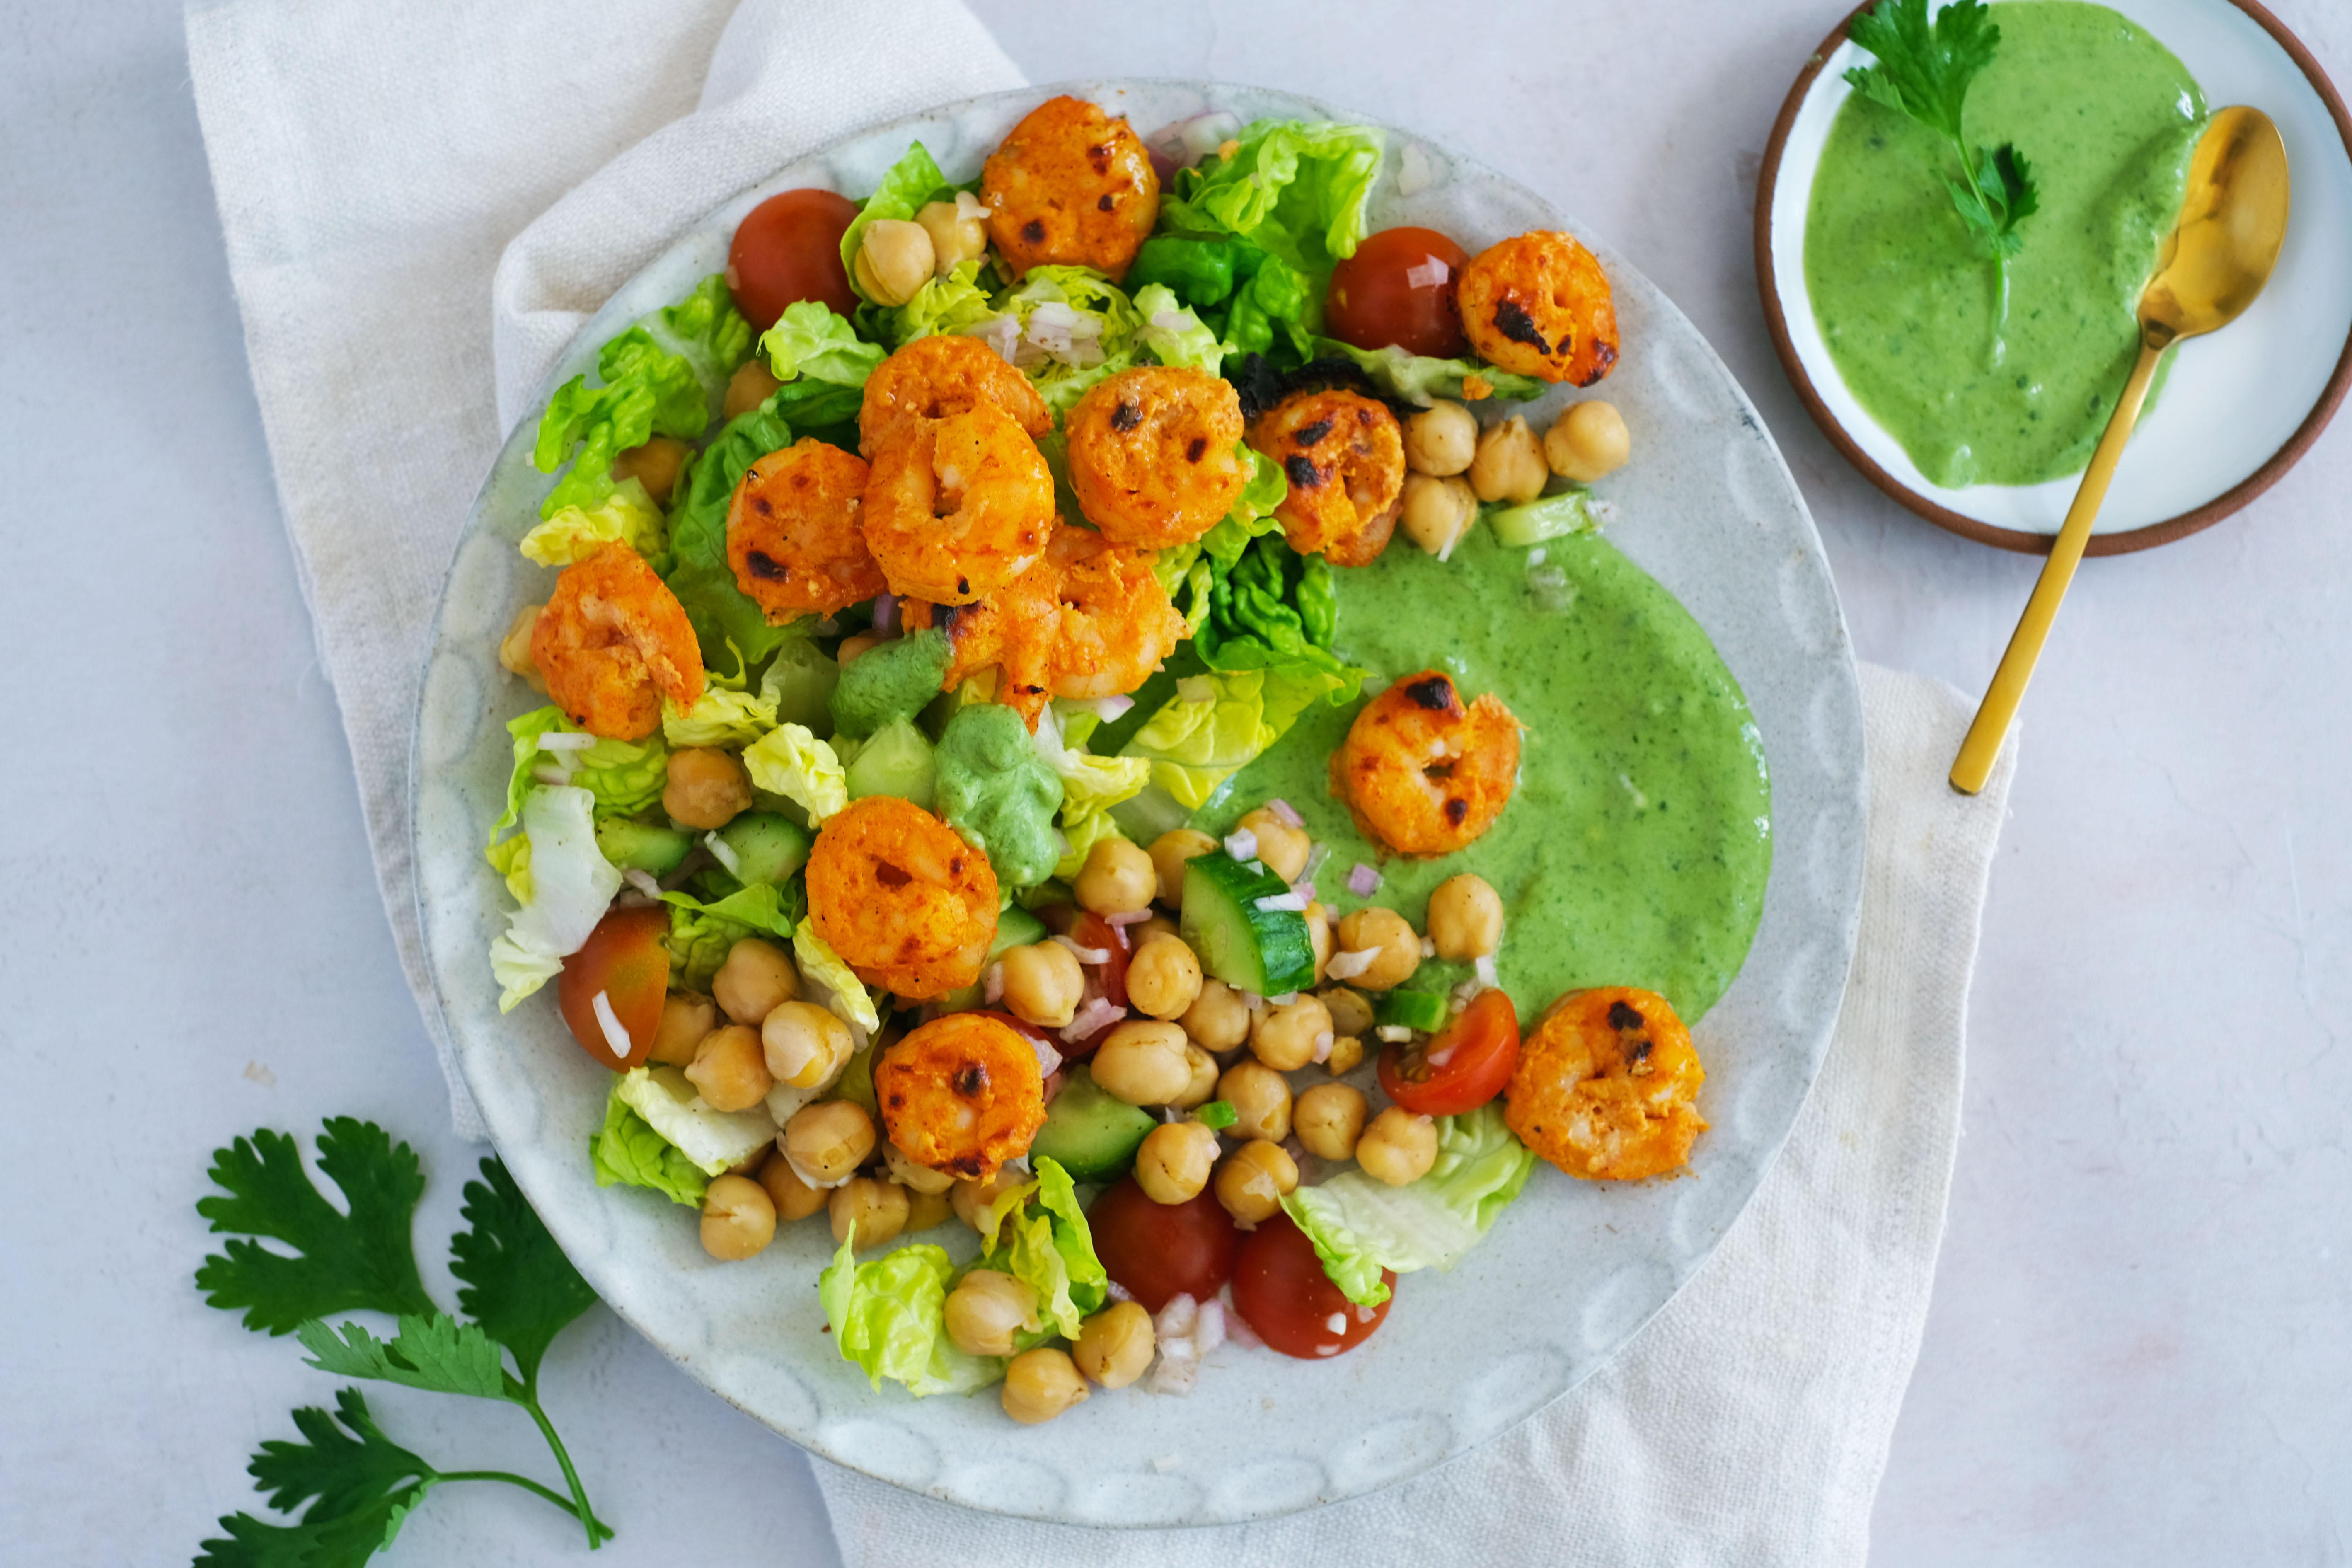 Tandoori Prawns with Chickpea Salad and Mint Yogurt